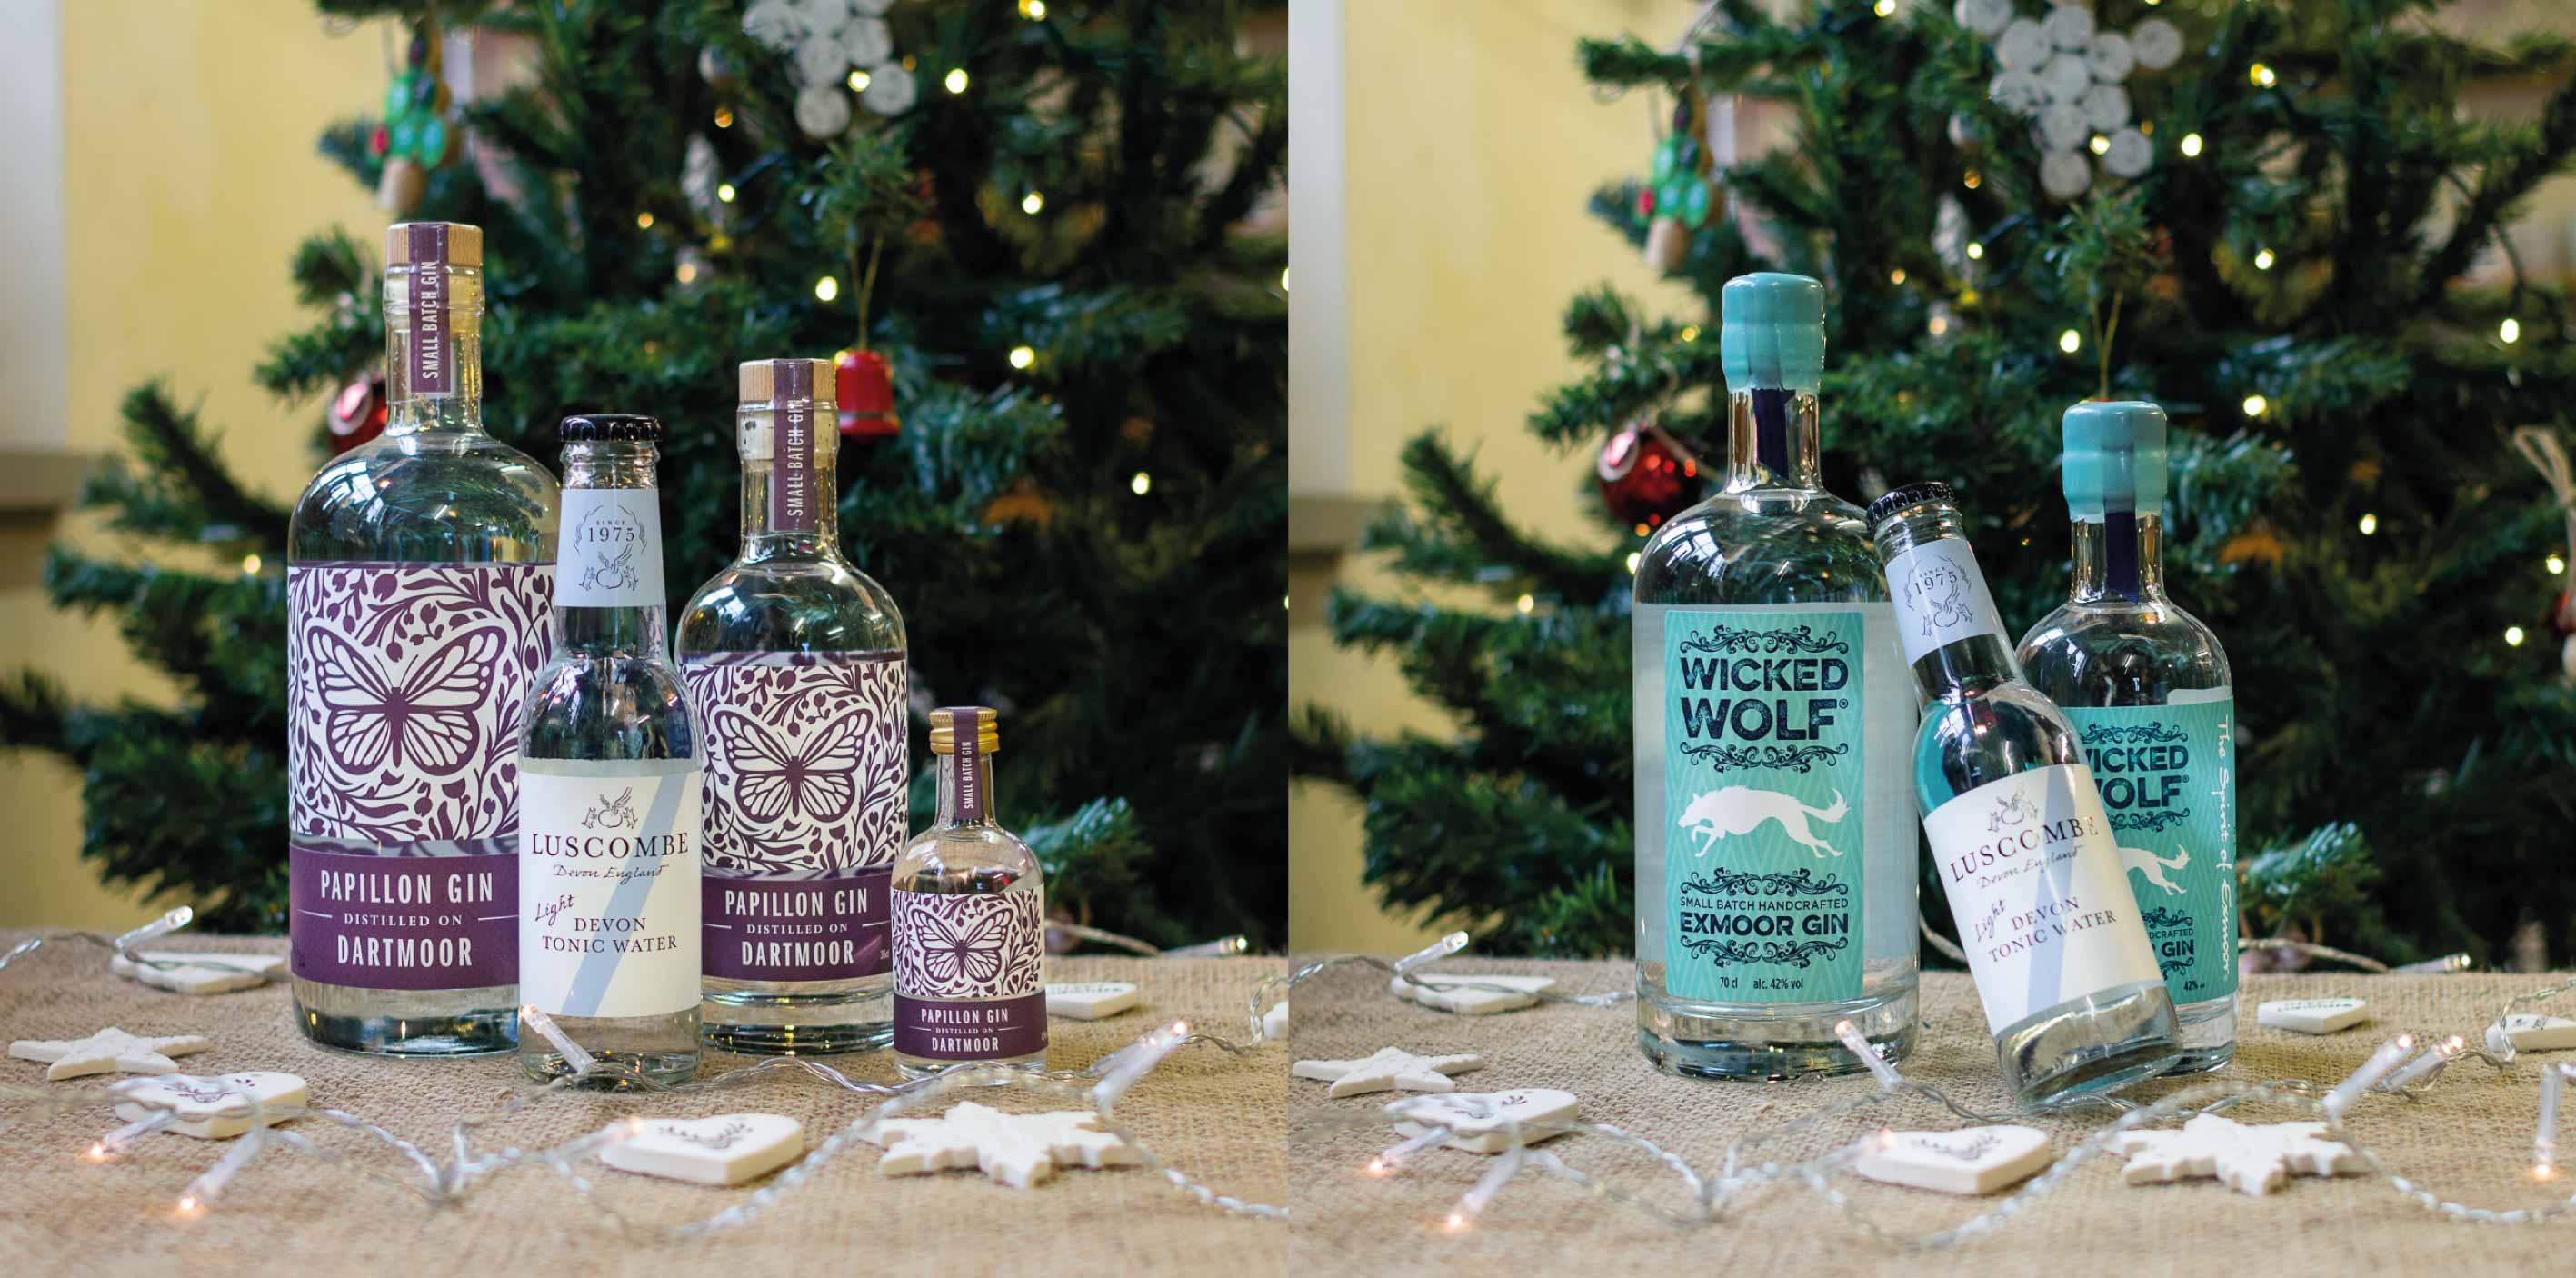 Buy local gin this Christmas at Alder Vineyard